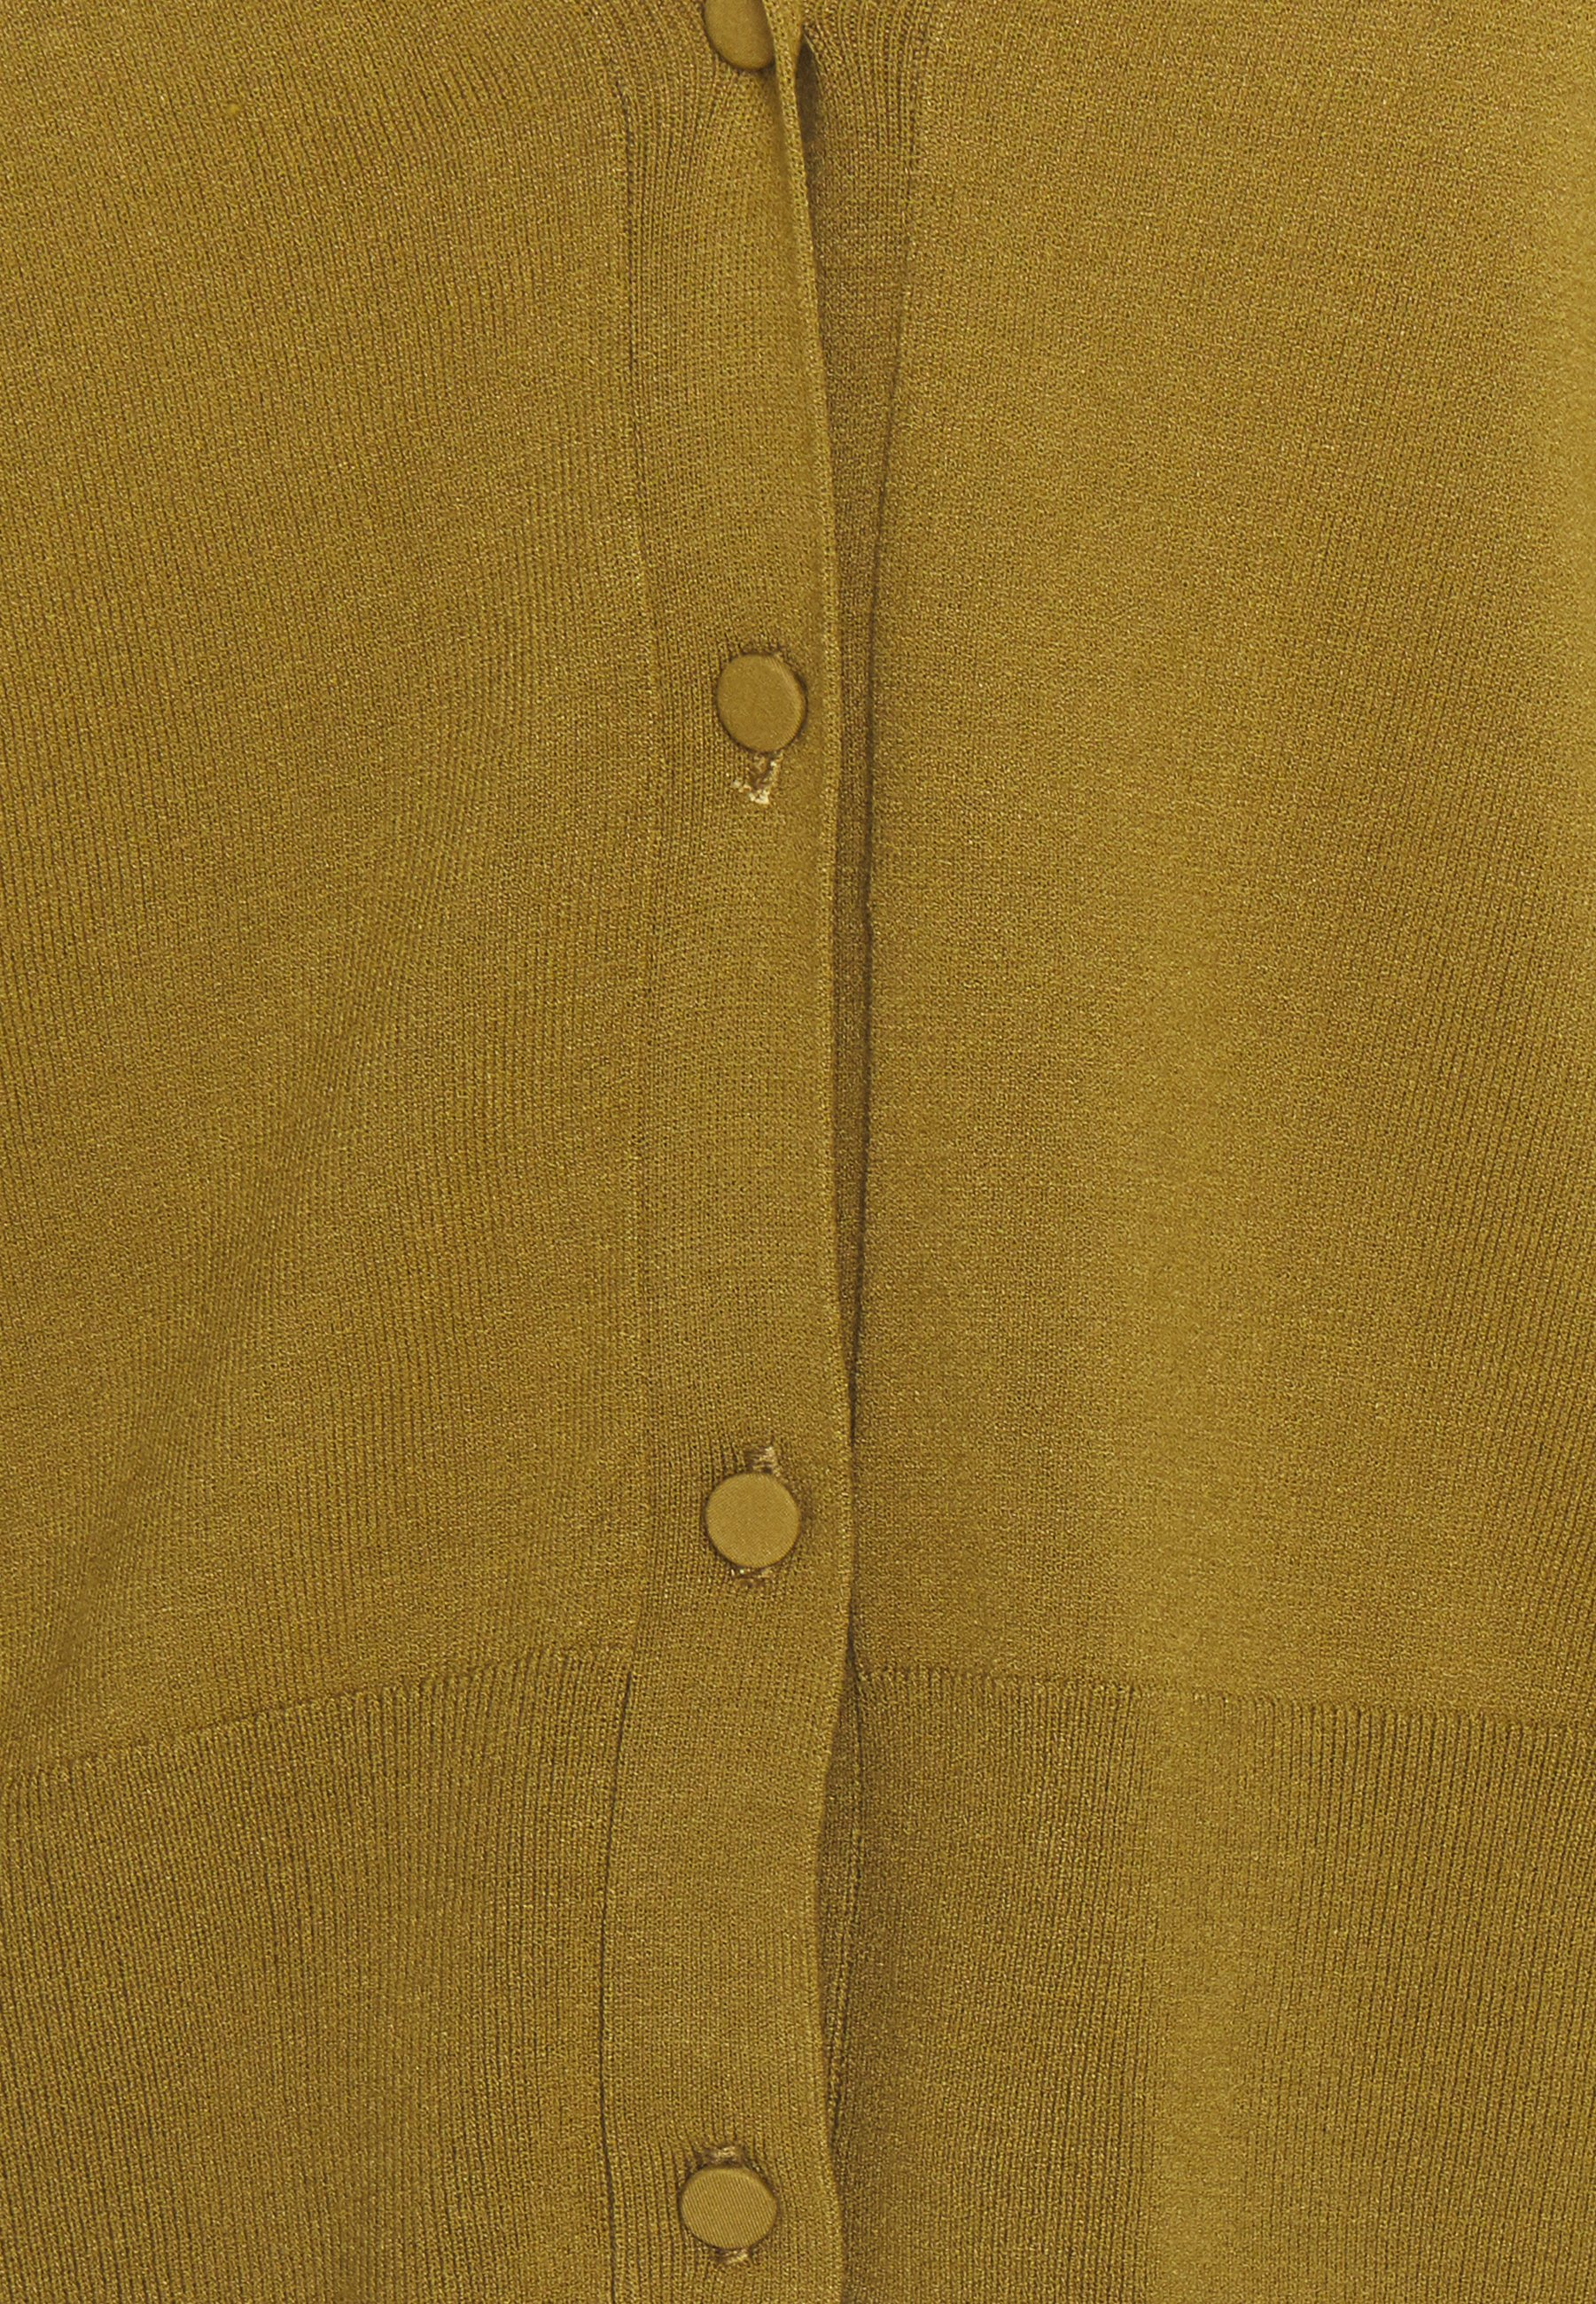 Esprit Collection Cardigan - Olive/oliven